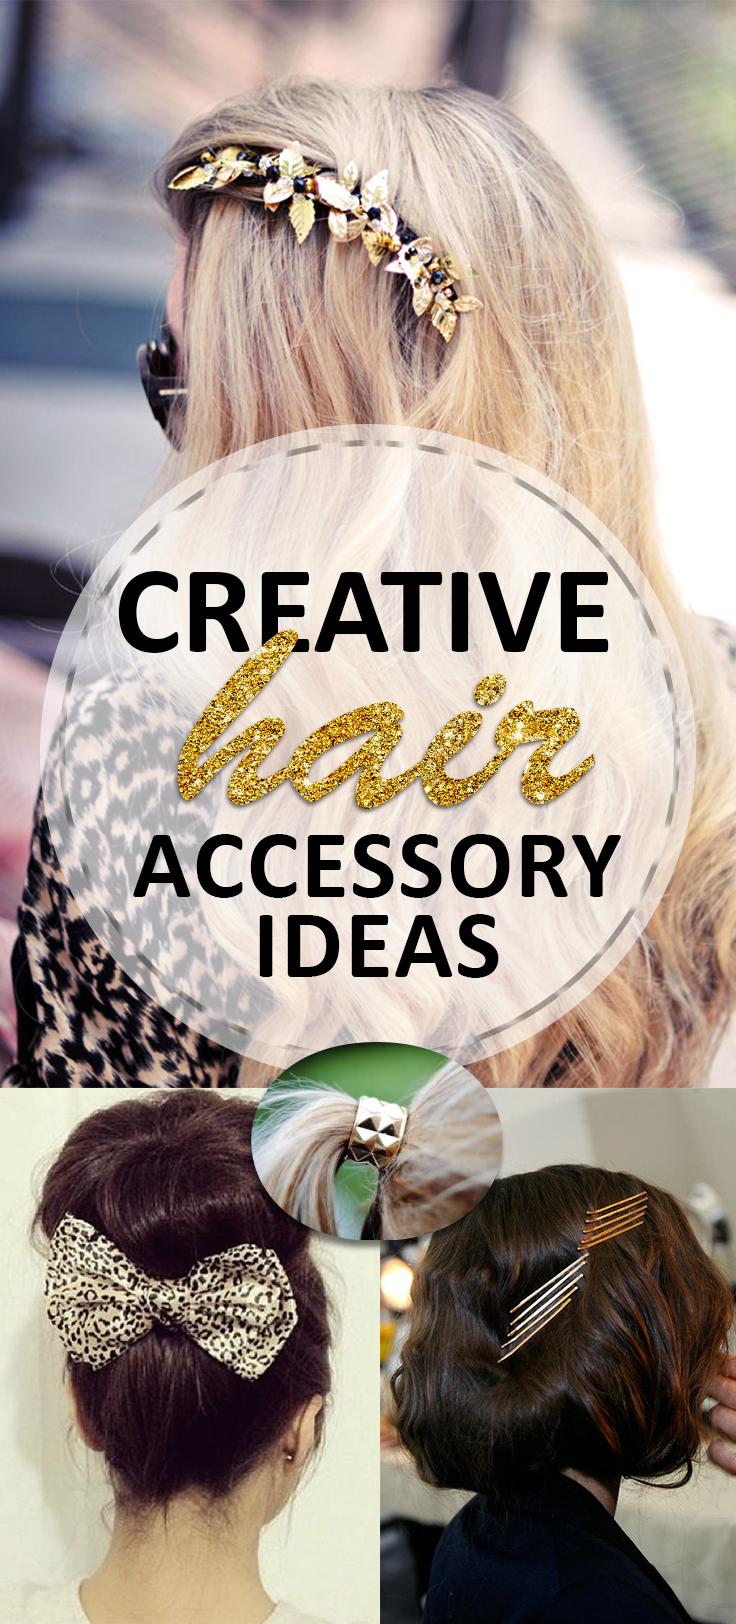 Creative Hair Accessory Ideas